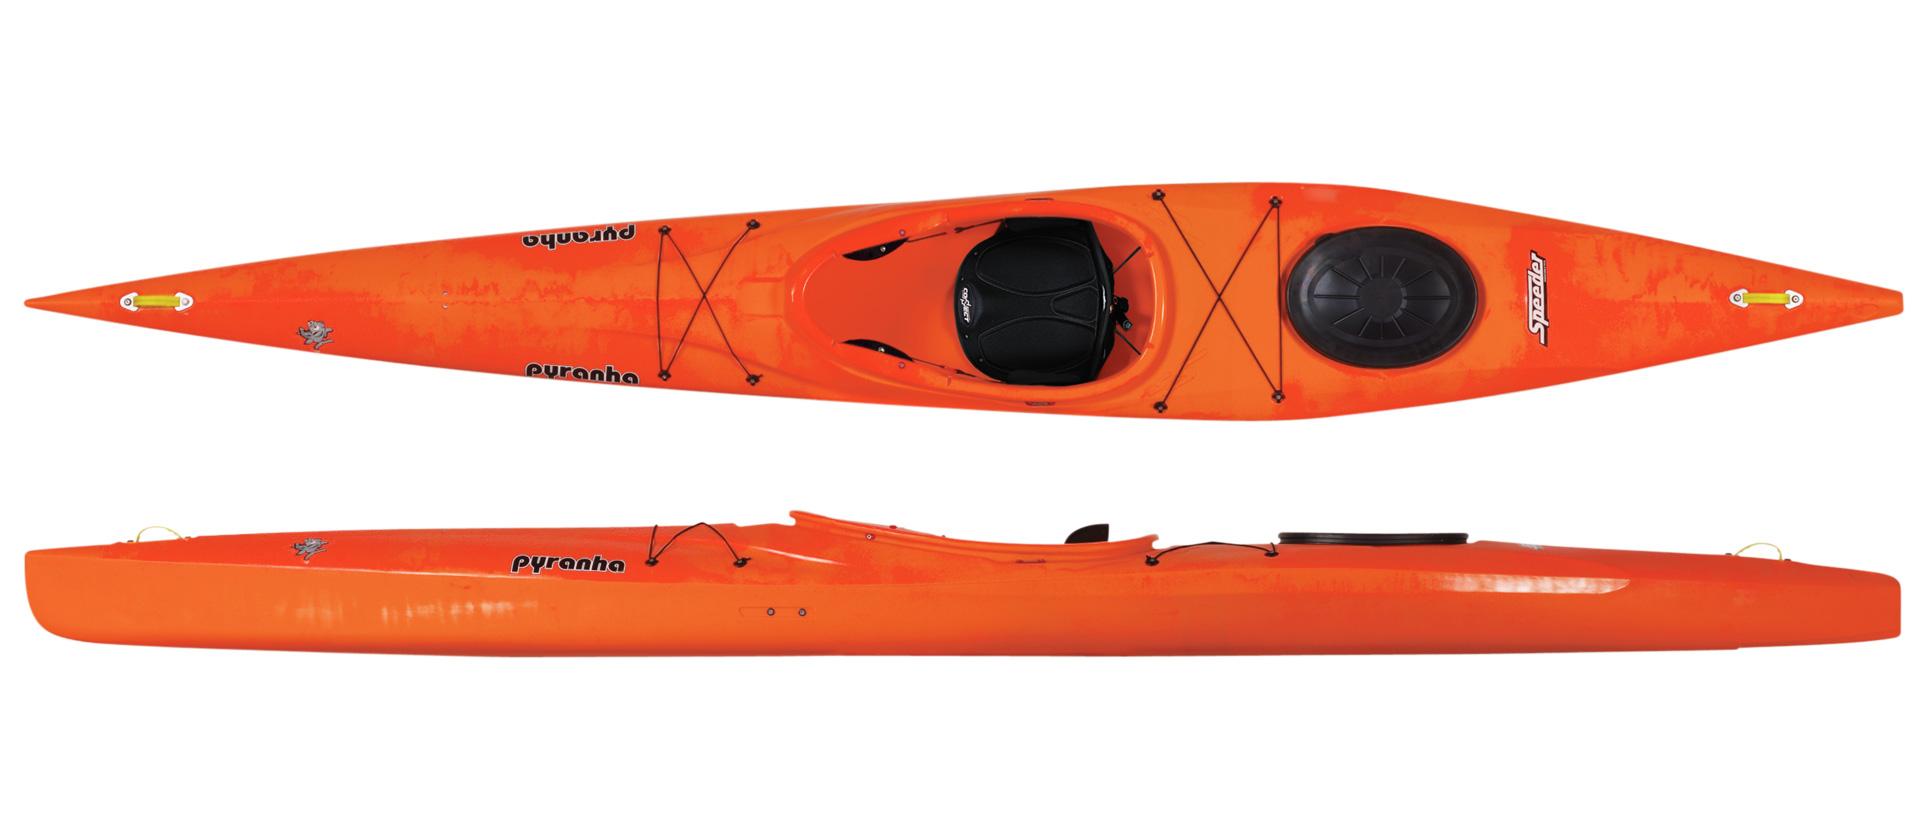 Kayak For Sale Craigslist Wv - Kayak Explorer